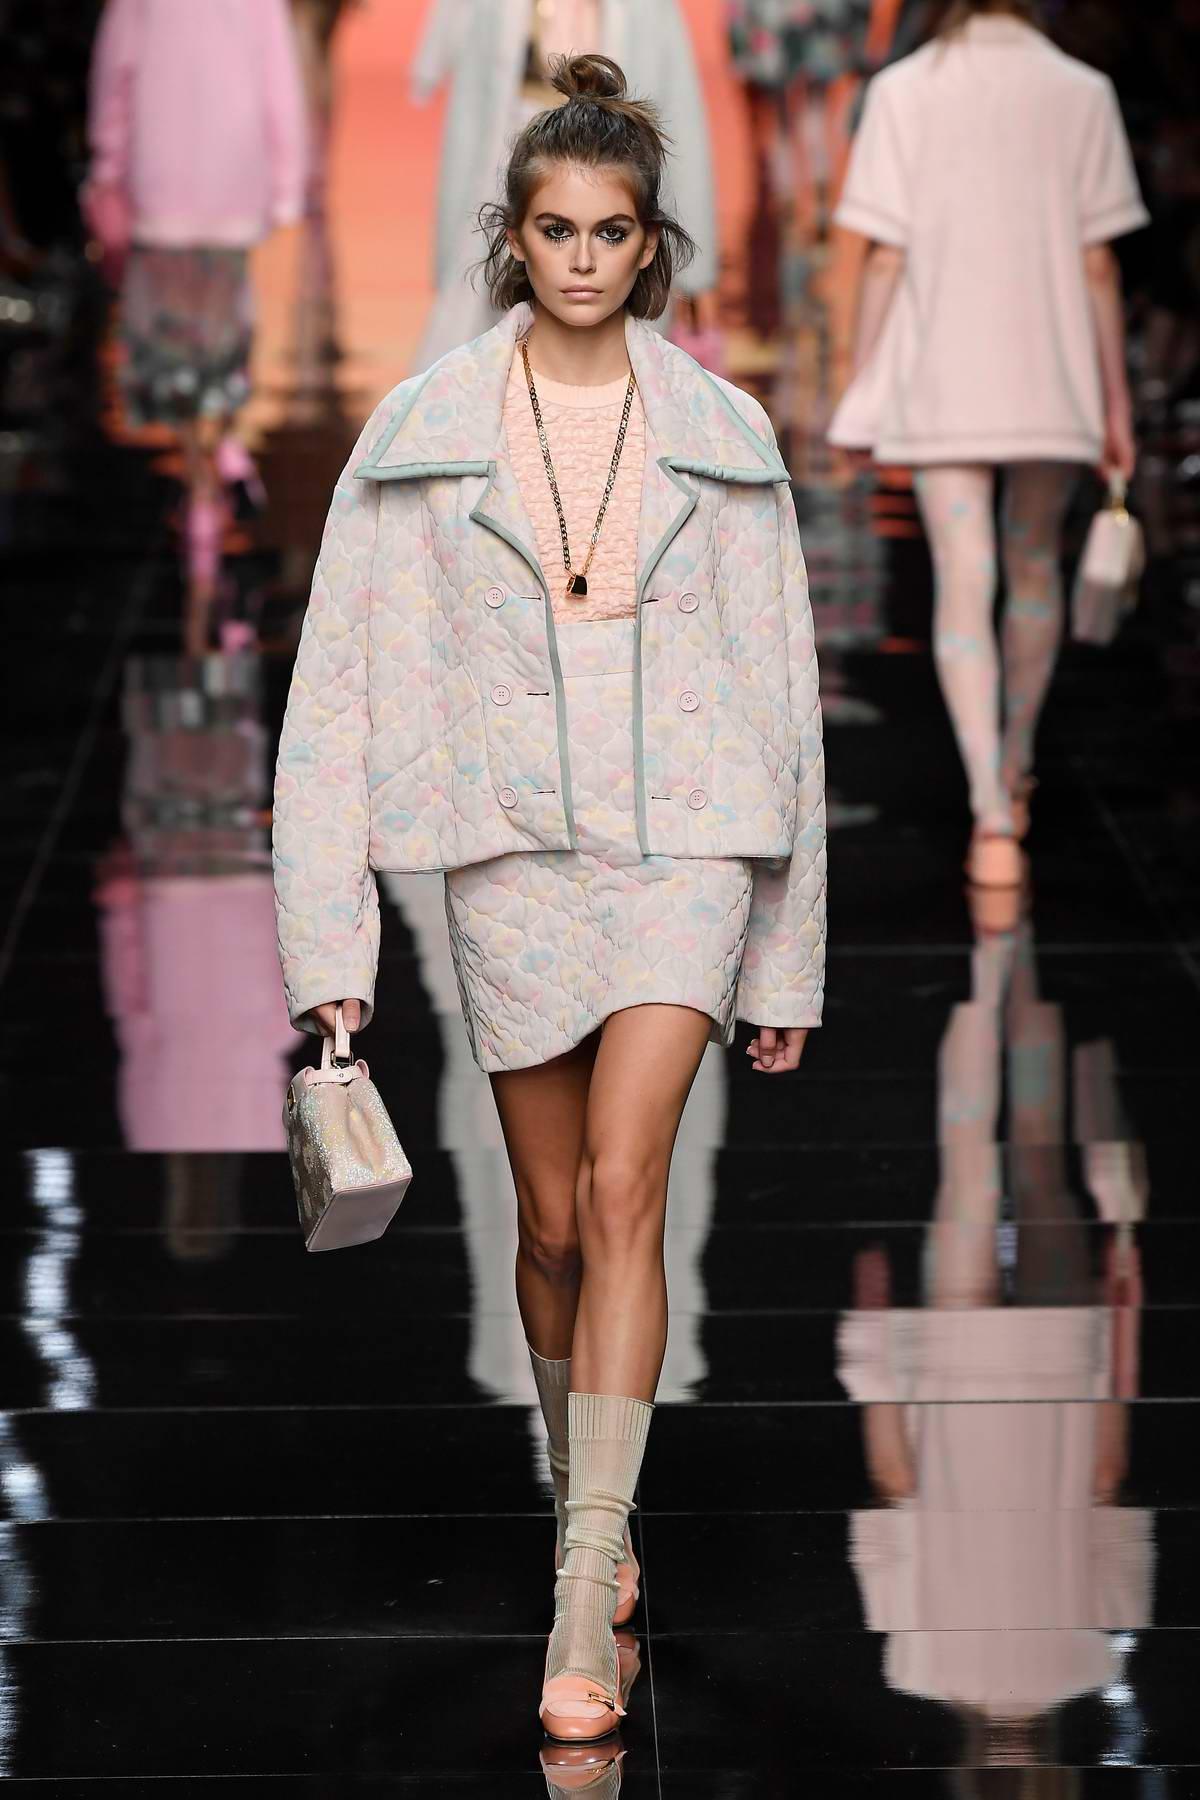 Kaia Gerber walks the runway at the Fendi show during Milan Fashion Week, Spring/Summer 2020 in Milan, Italy